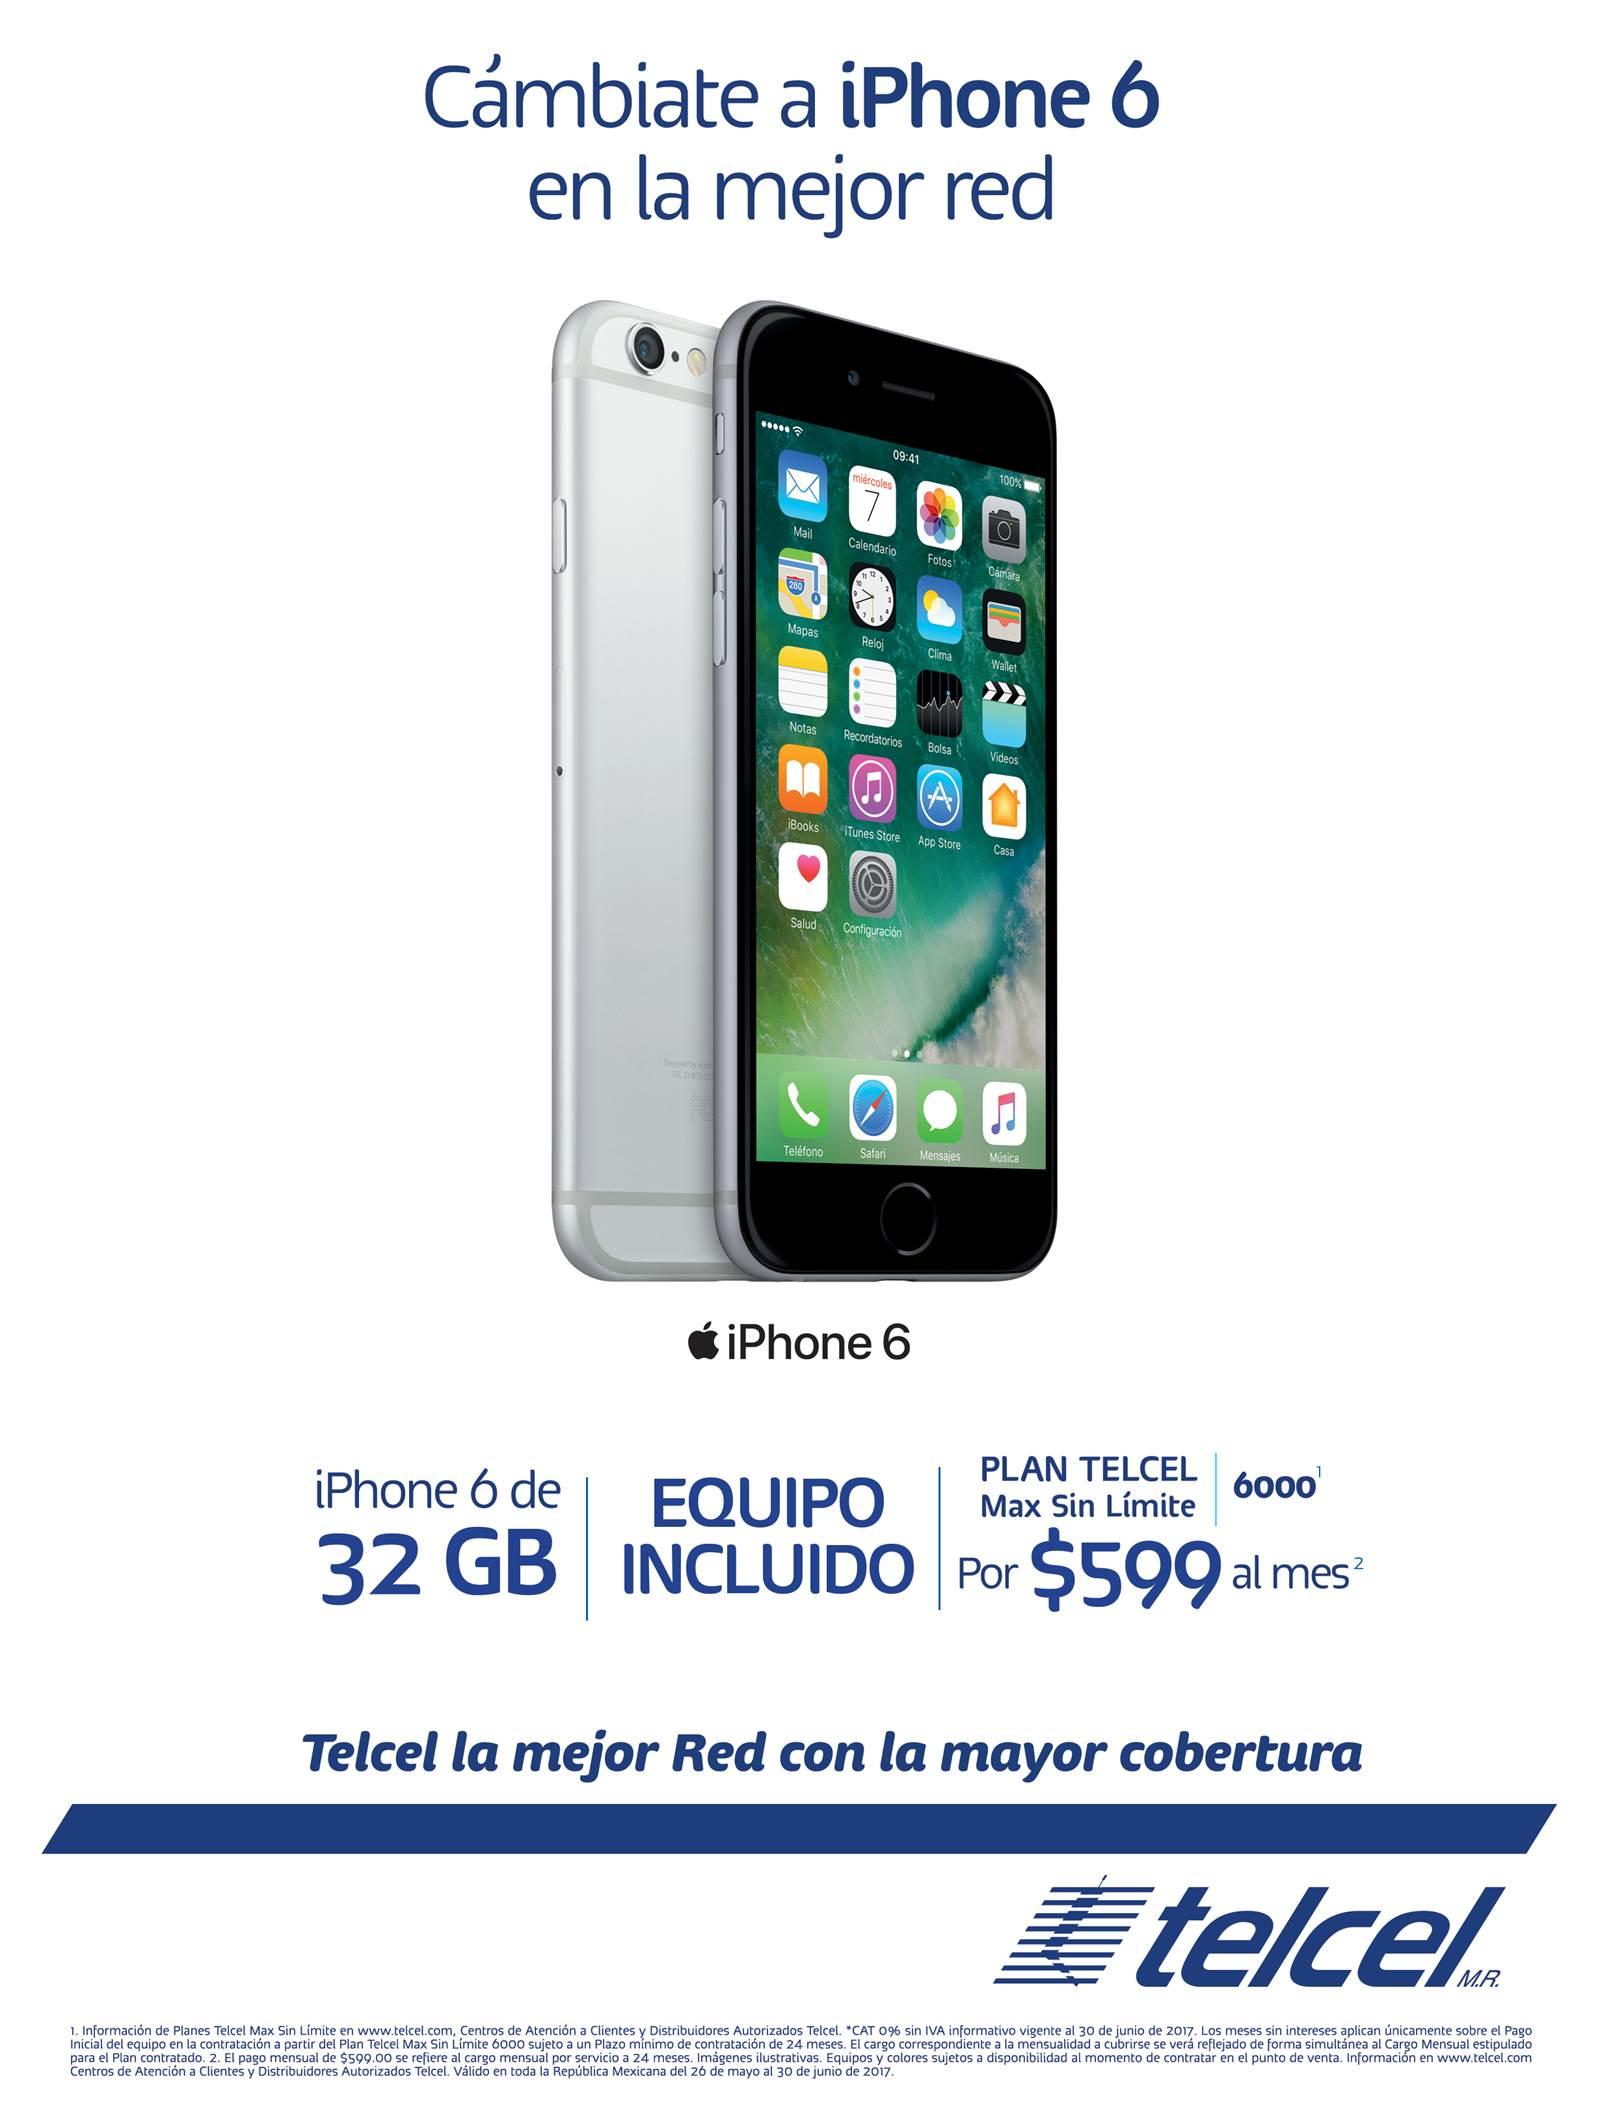 Telcel: IPHONE 6 EN PLAN DE RENTA $599.00 A 24 MESES